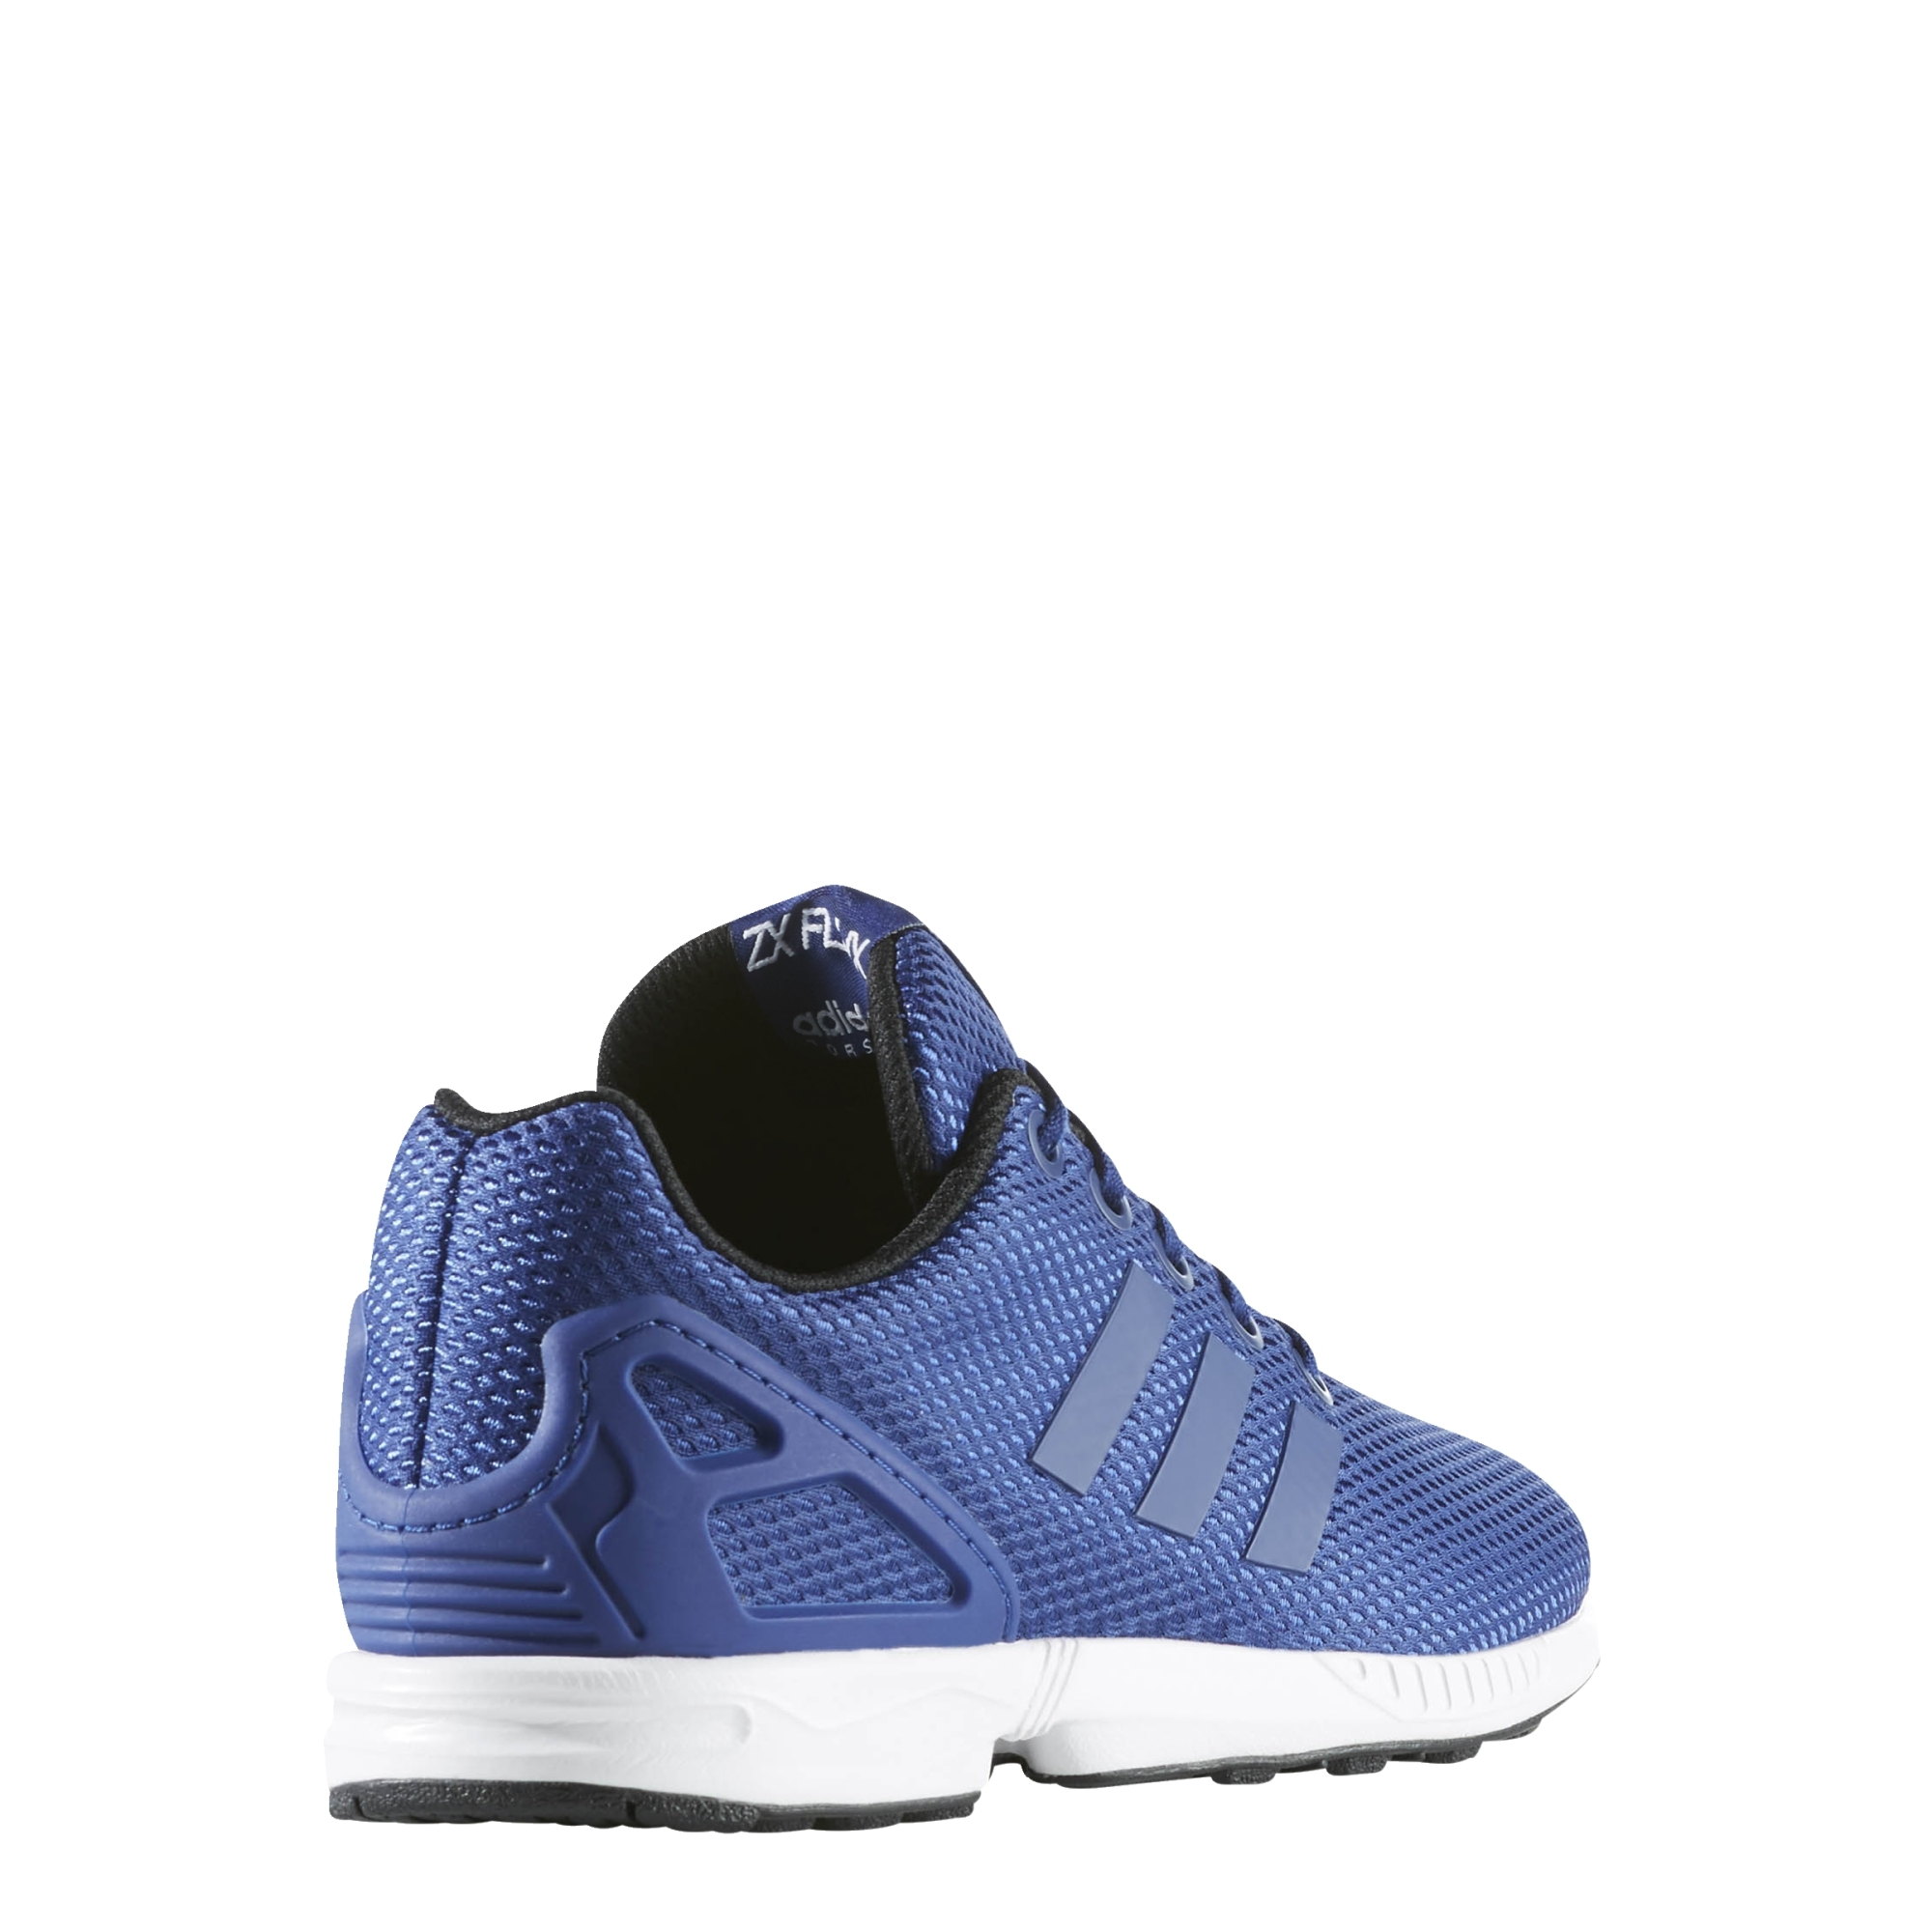 adidas Originals Zx Flux K S76282